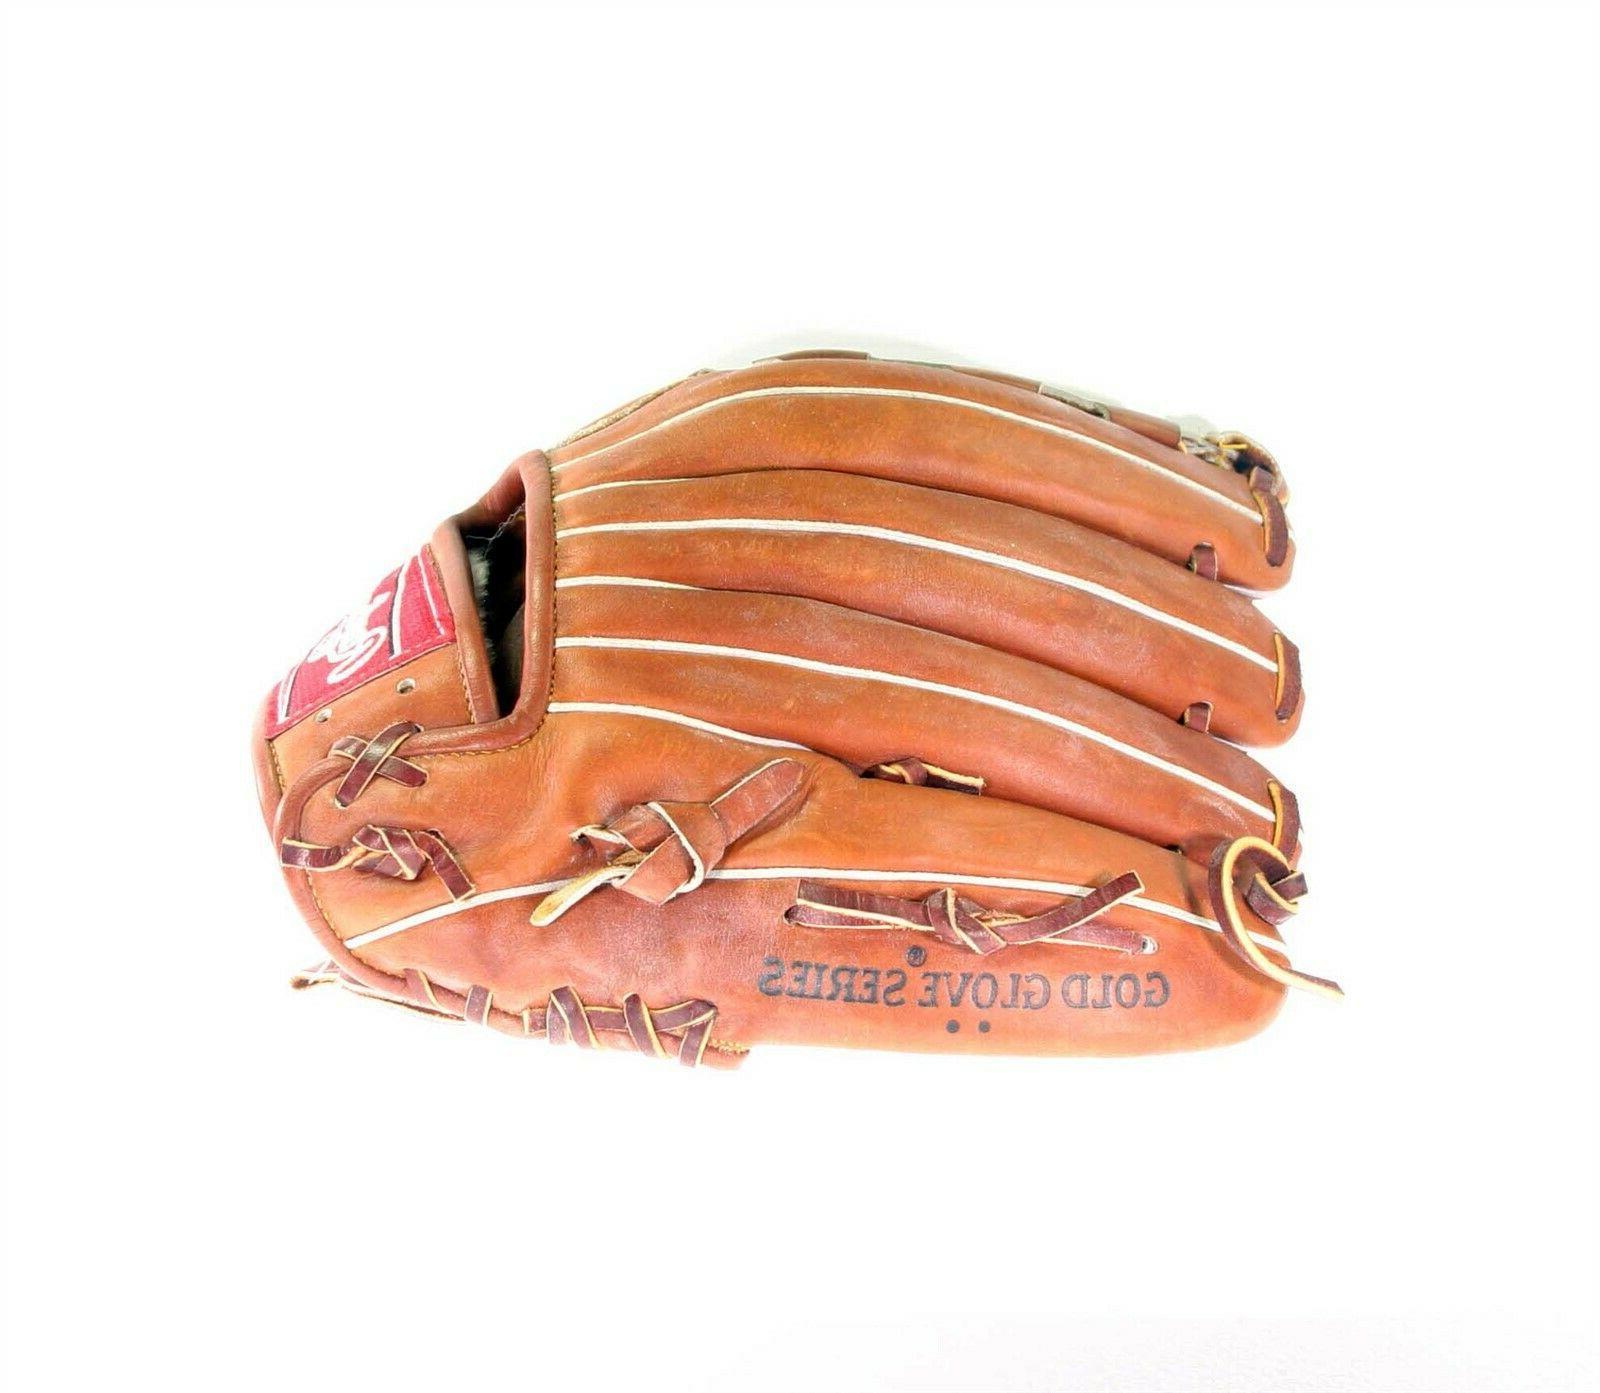 heart of the hide baseball glove 12